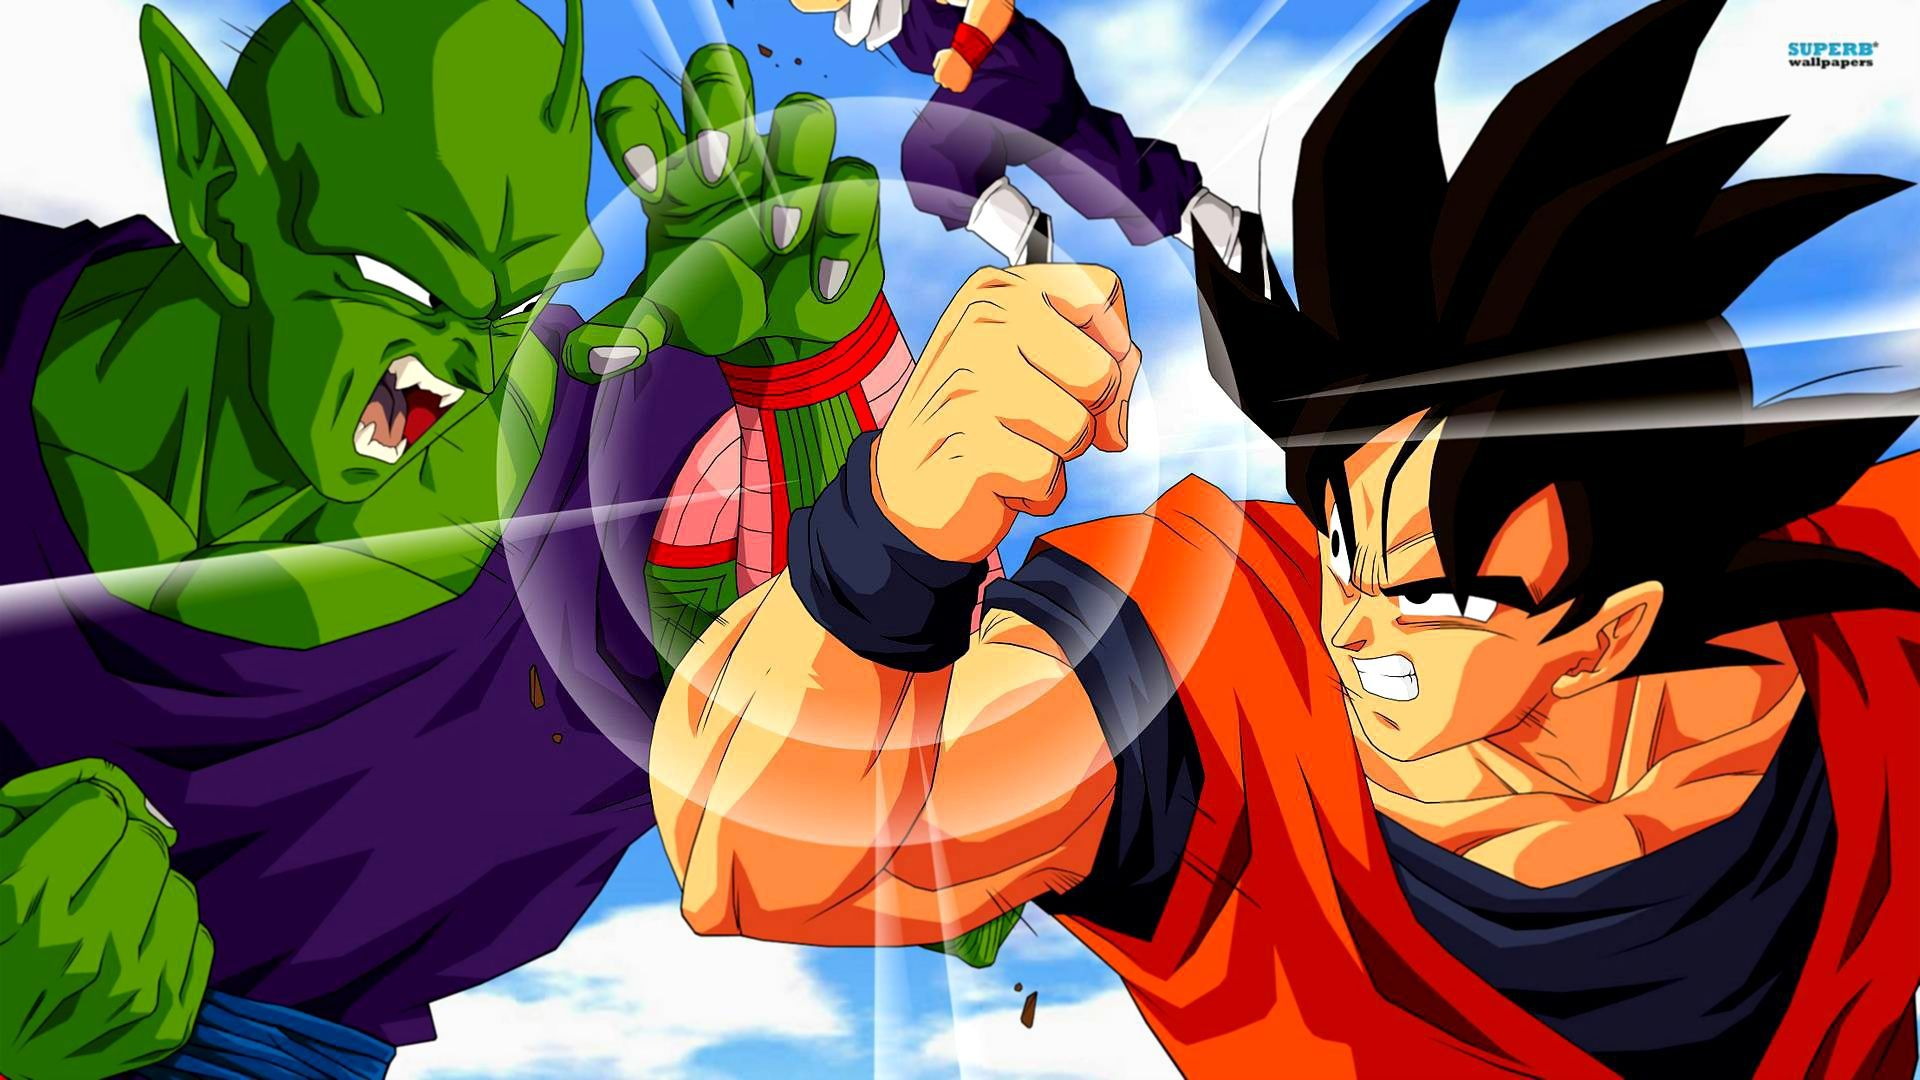 Dragon Ball Z Wallpapers Goku Super Saiyan 12 Wallpaper Dragon